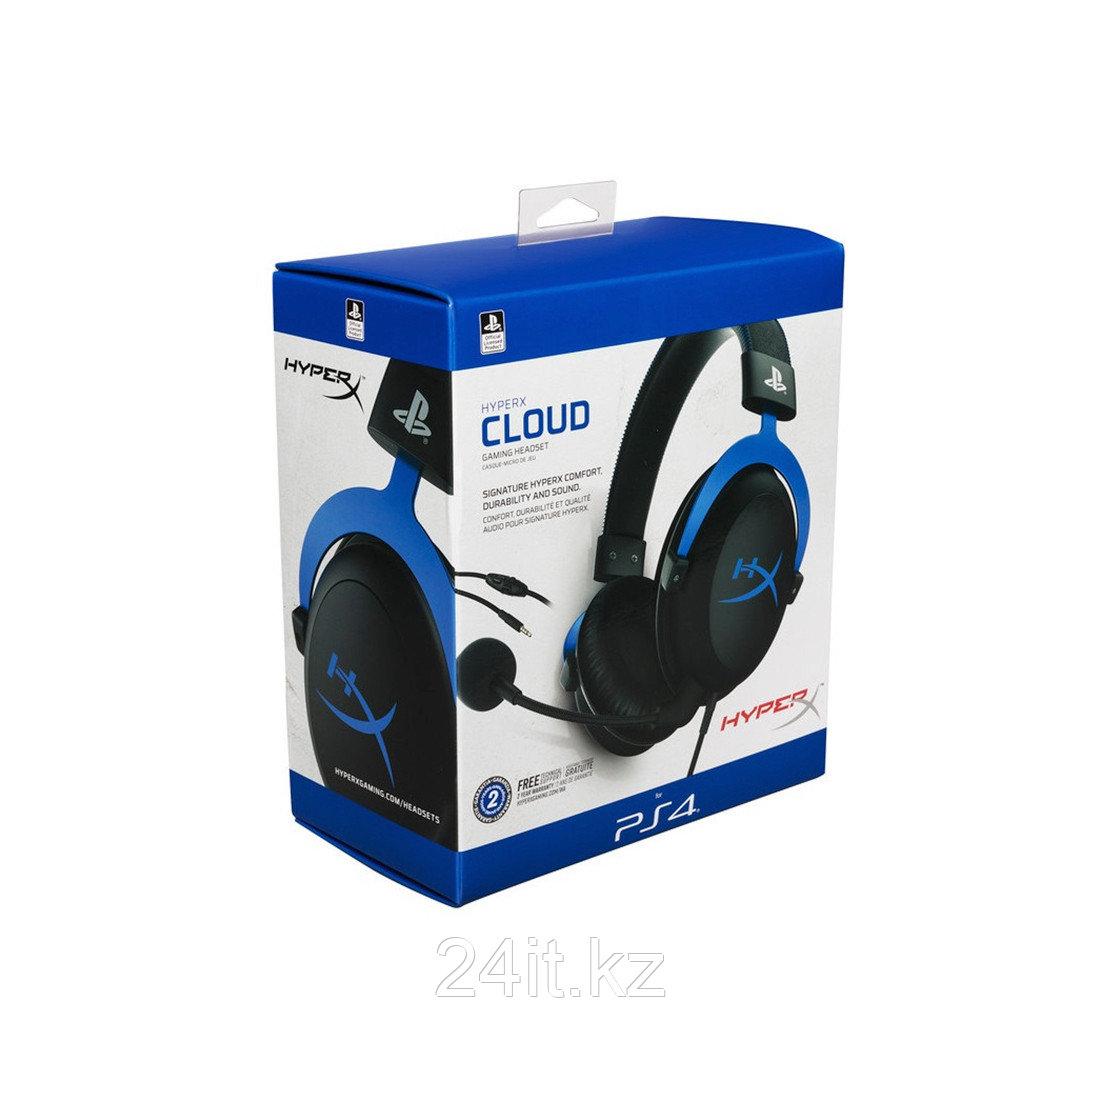 Гарнитура HyperX Cloud Gaming Headset - Blue for PS4 HX-HSCLS-BL/EM - фото 3